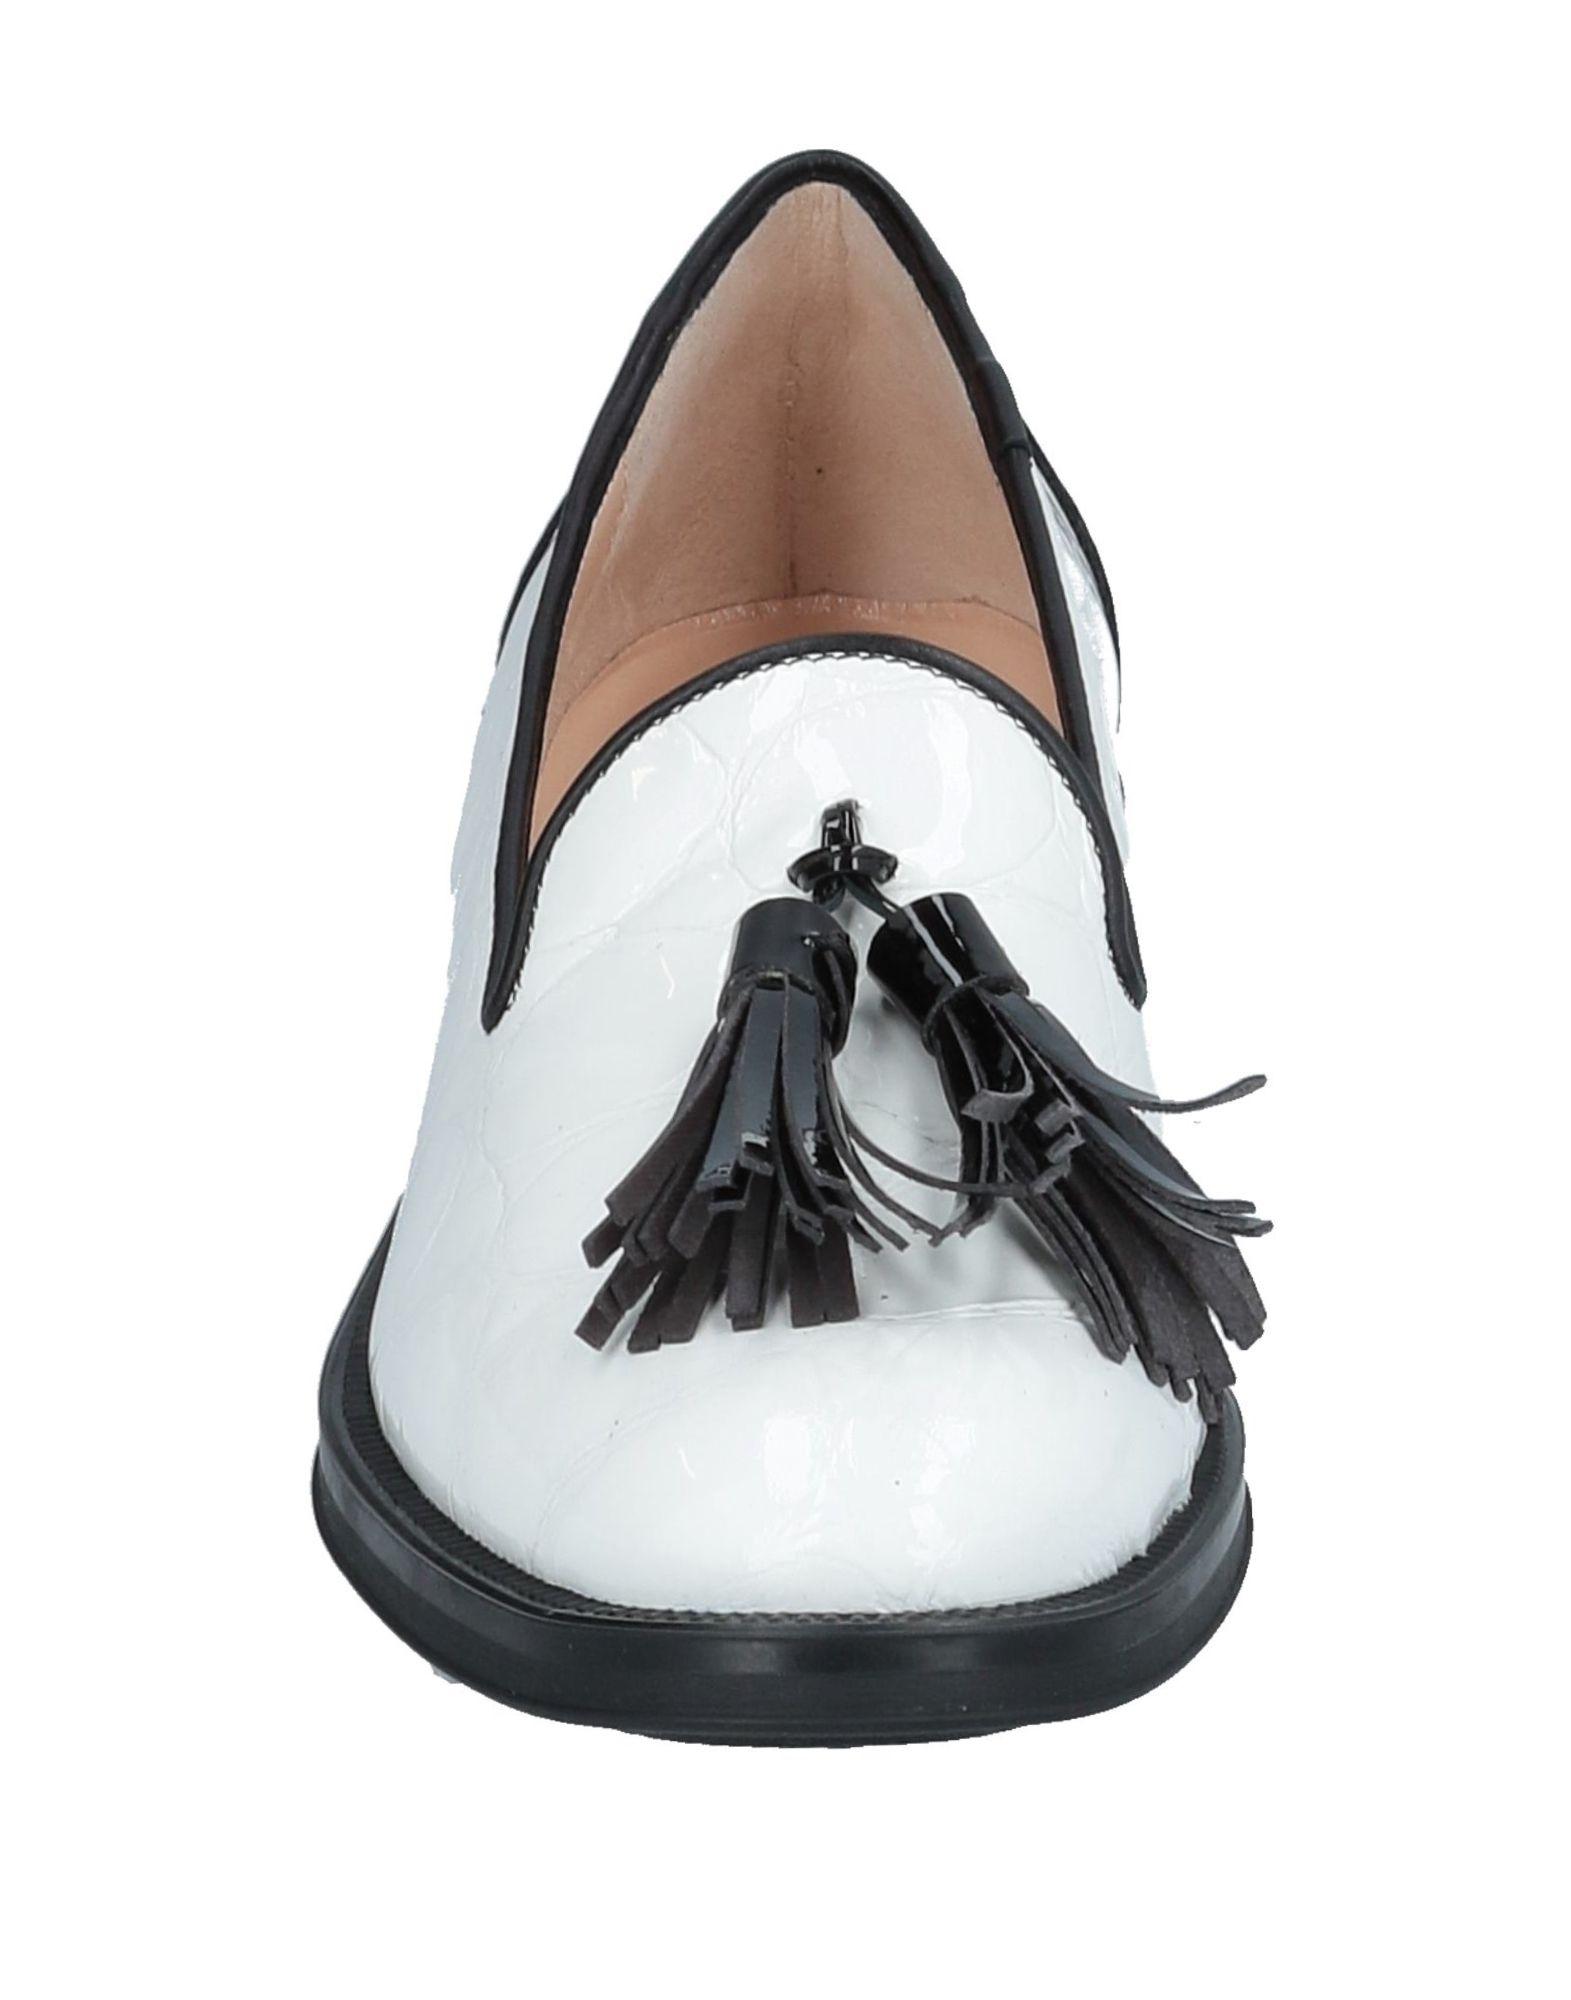 F.Lli Bruglia 11520110RDGut Mokassins Damen  11520110RDGut Bruglia aussehende strapazierfähige Schuhe 423dec